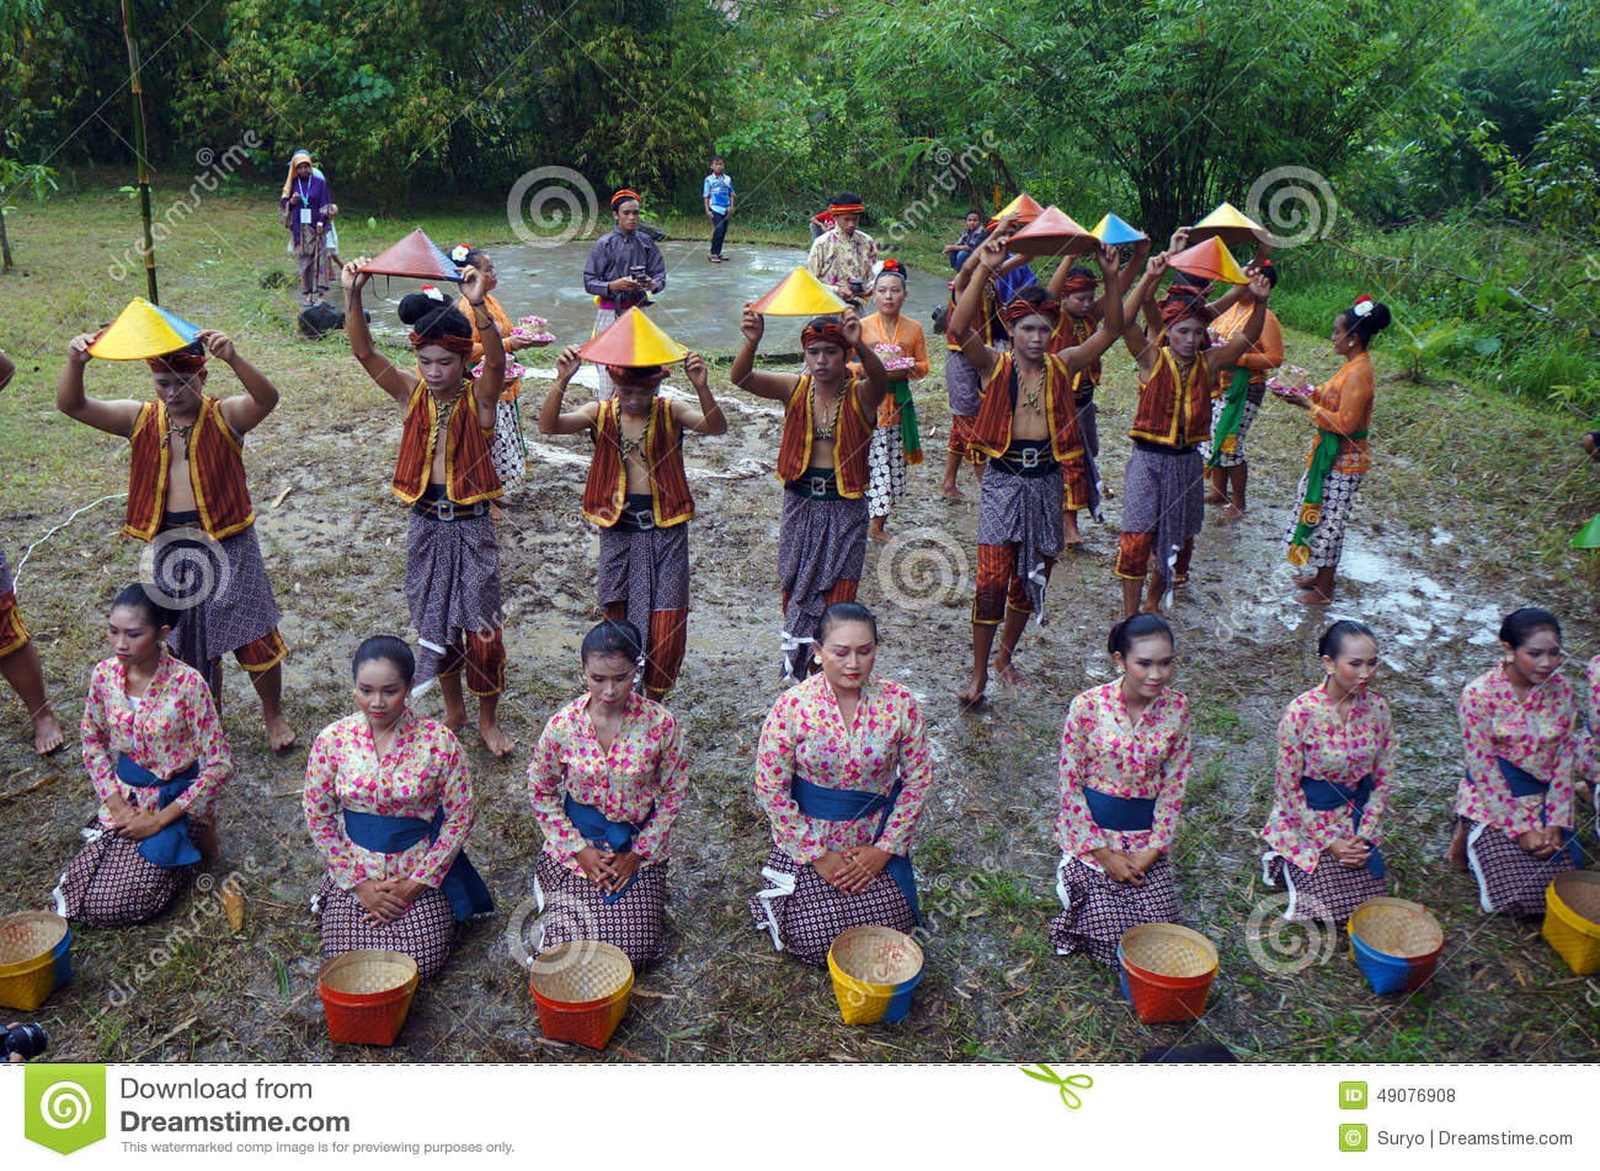 harvest festival in indonesia